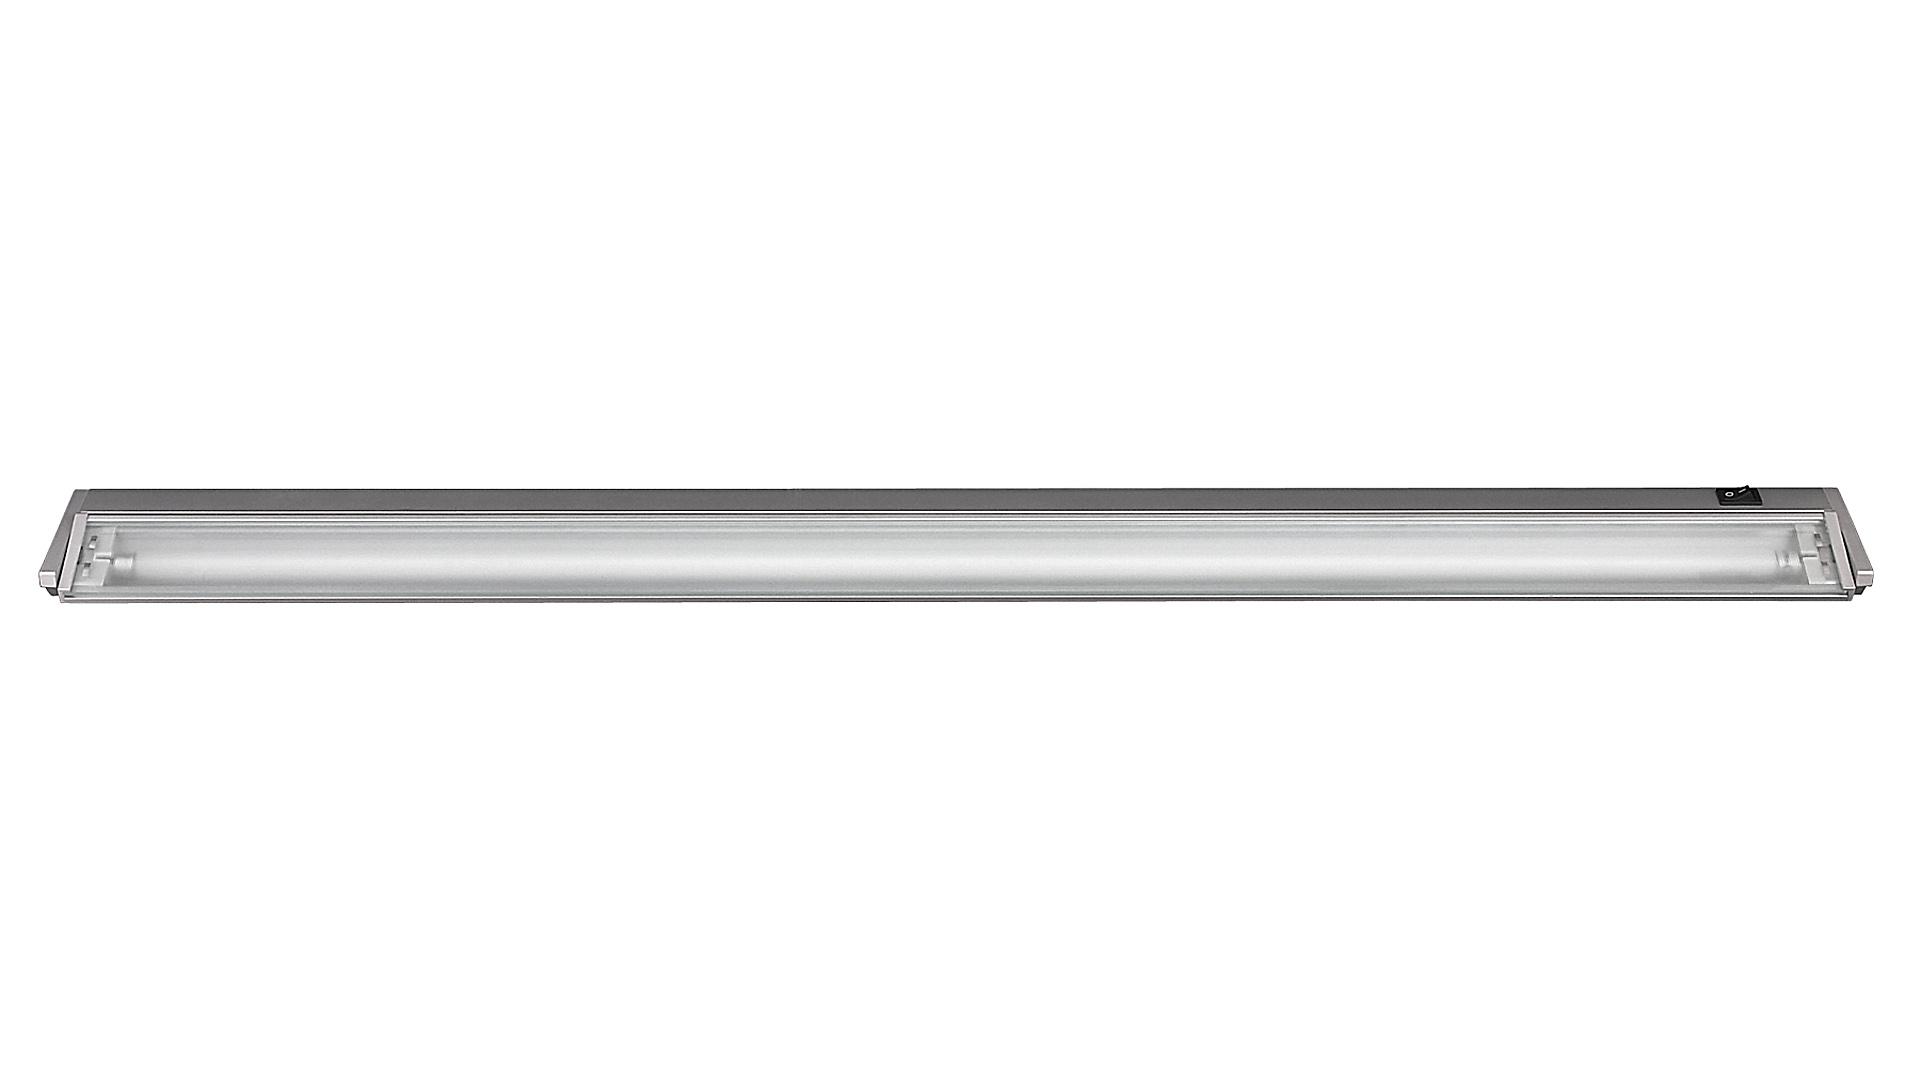 RABALUX EASY LIGHT 2366 kuchyňské svítidlo